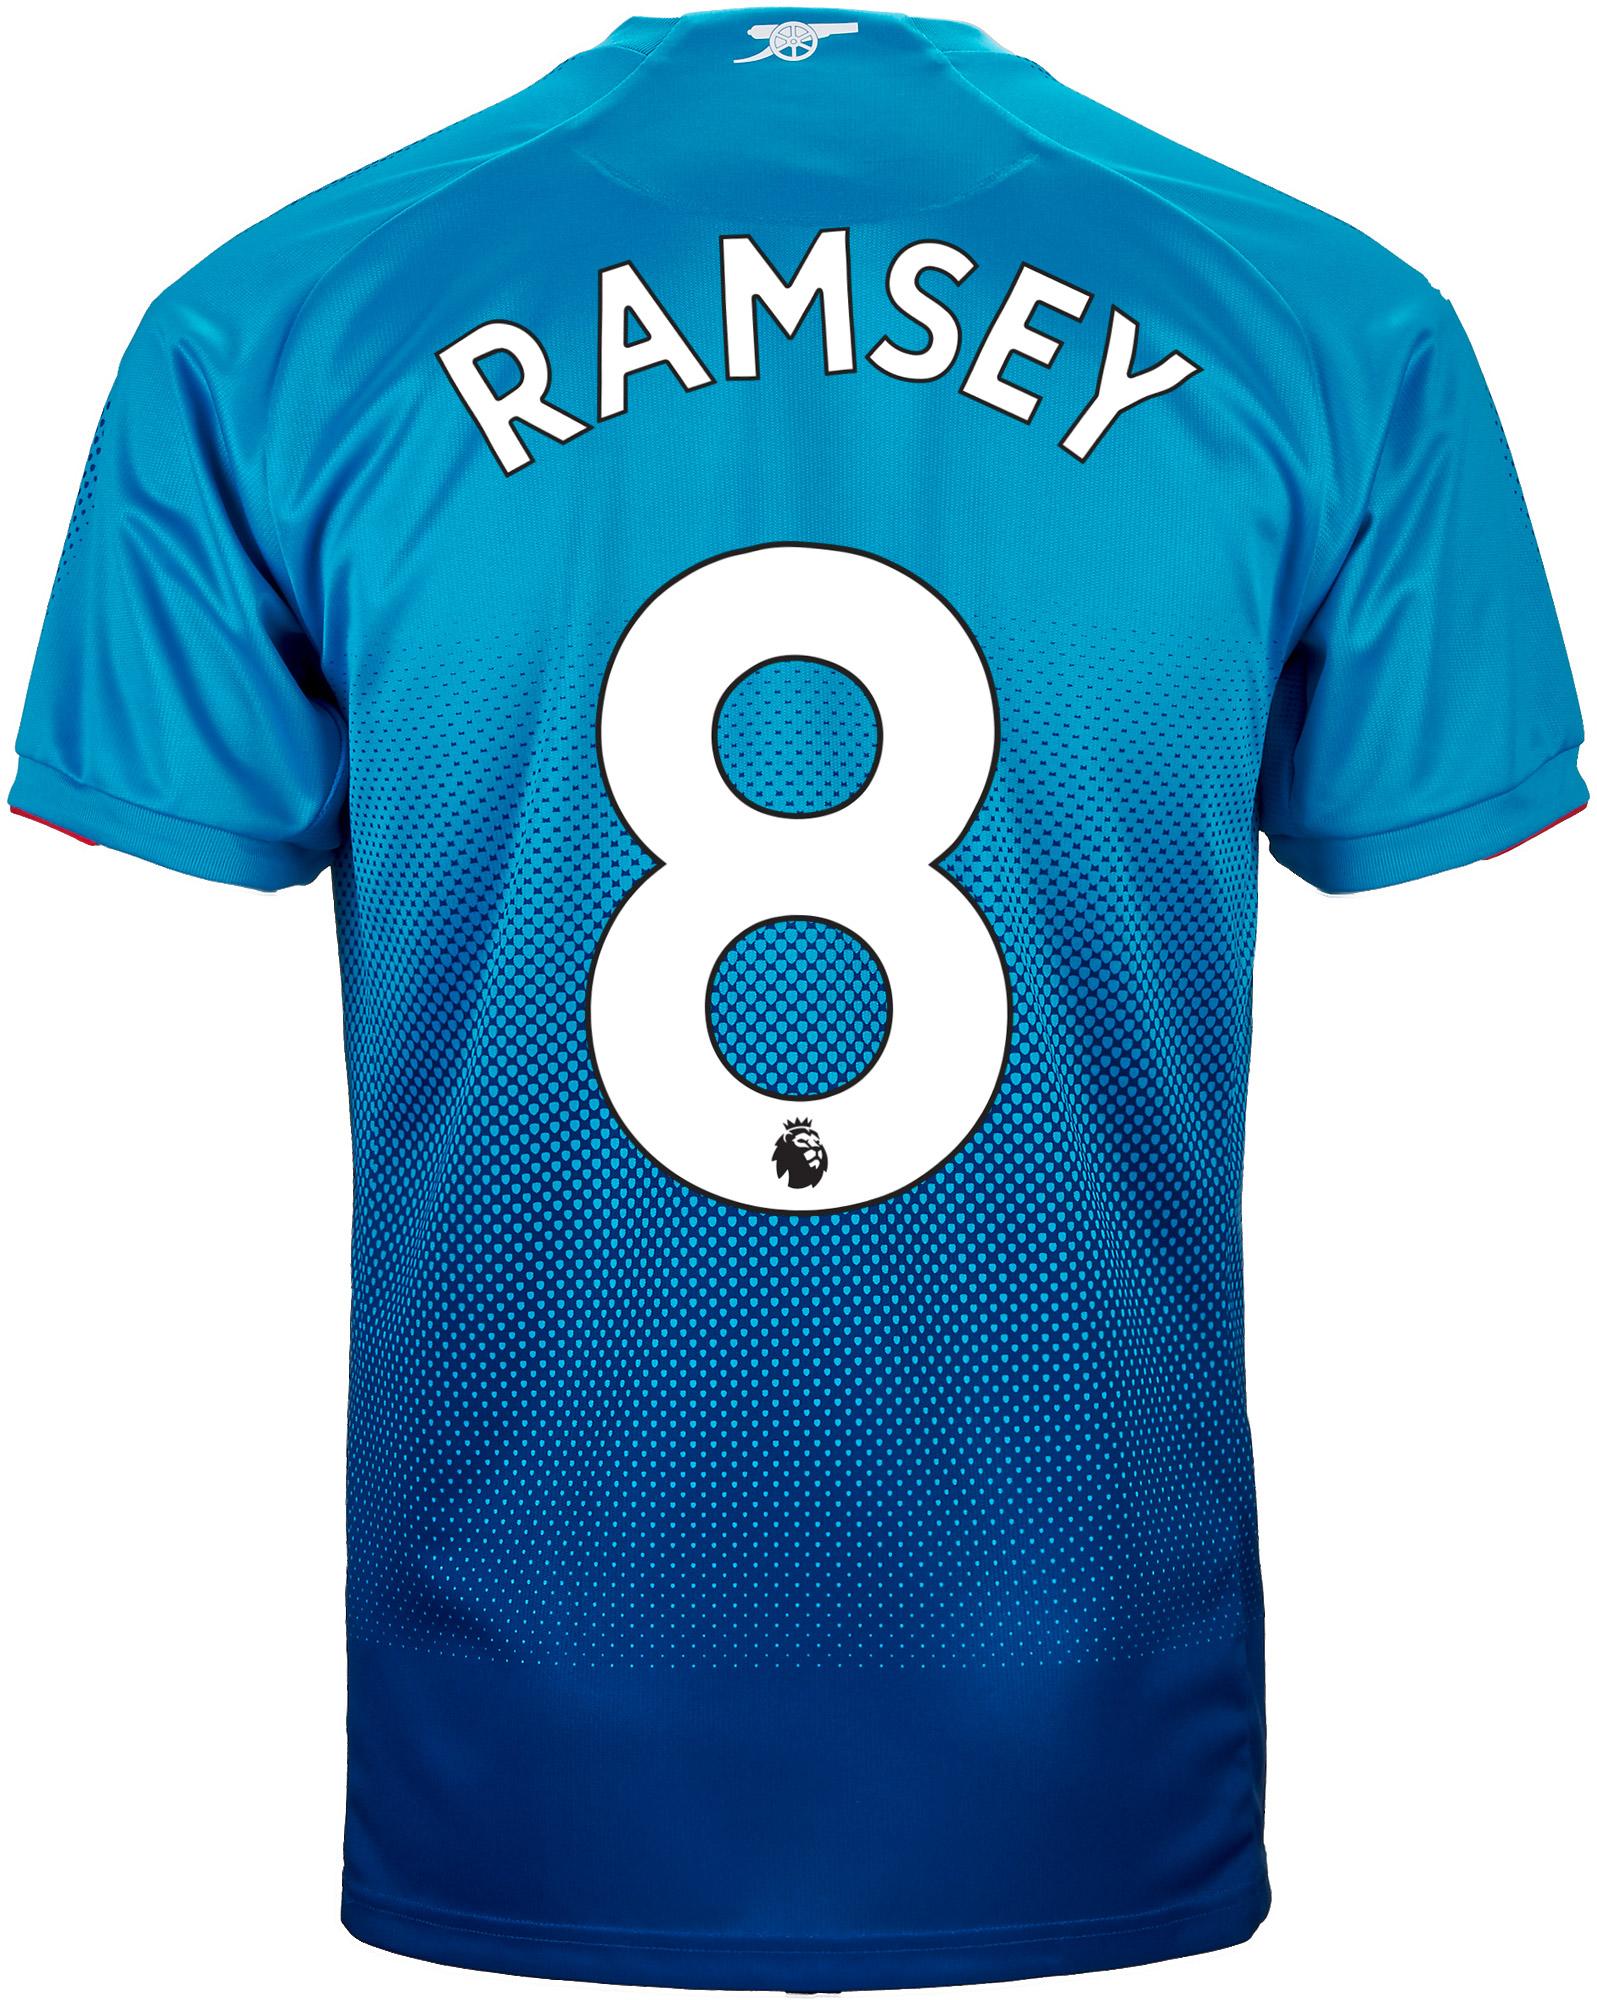 separation shoes 7a93f 0adfc 2017/18 Puma Aaron Ramsey Arsenal Away Jersey - SoccerPro